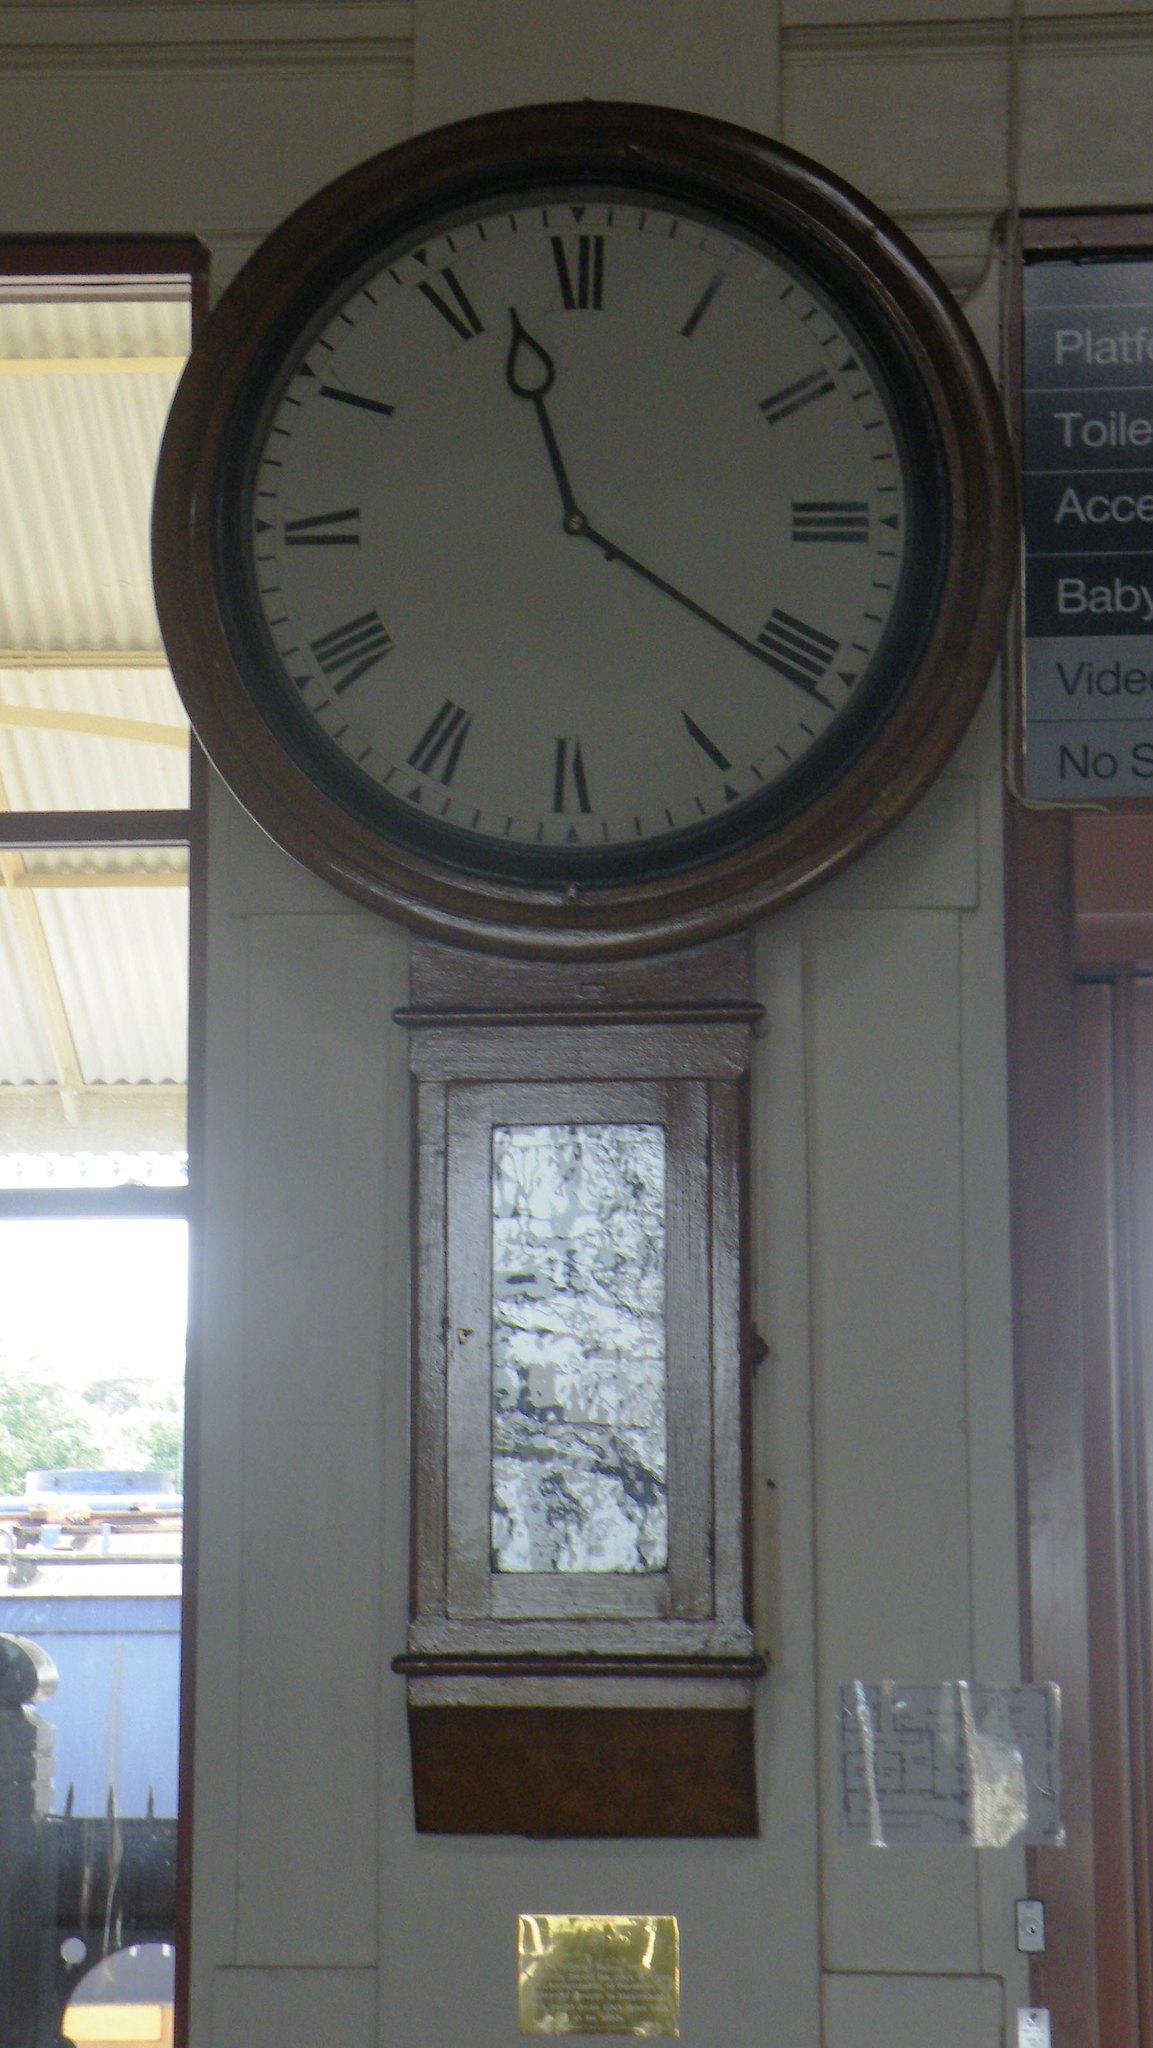 Old Clock inside booking hall at Maryborough Railway Station by denmac25